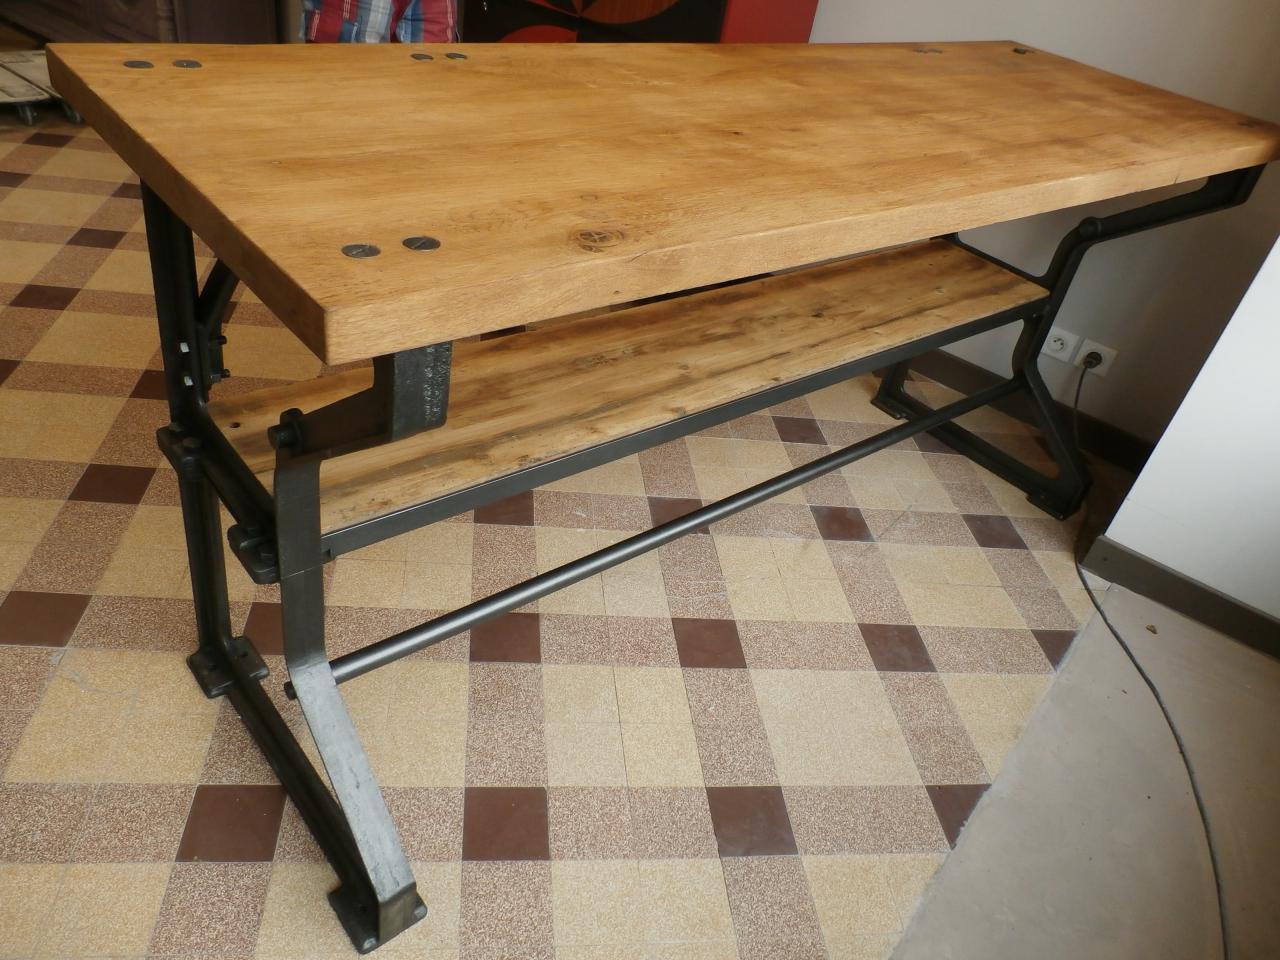 Meubles de métiers meubles relookés relooking meuble relooké